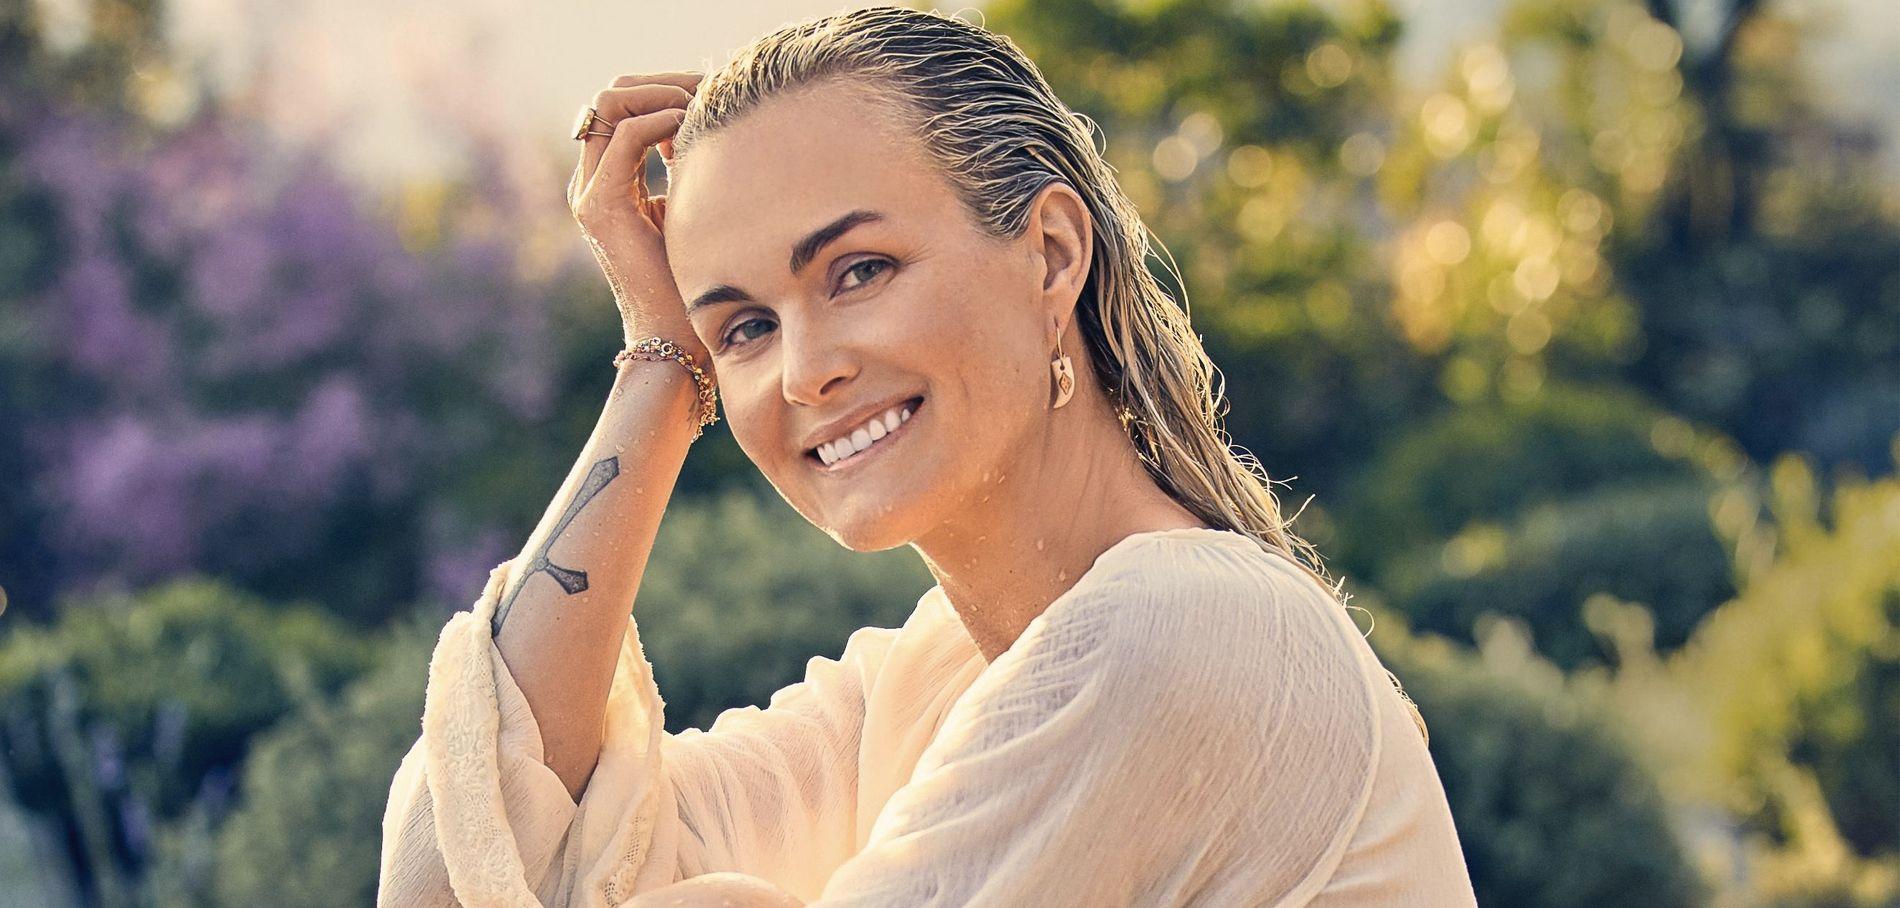 Laeticia Hallyday : week-end en amoureux avec Jalil Lespert